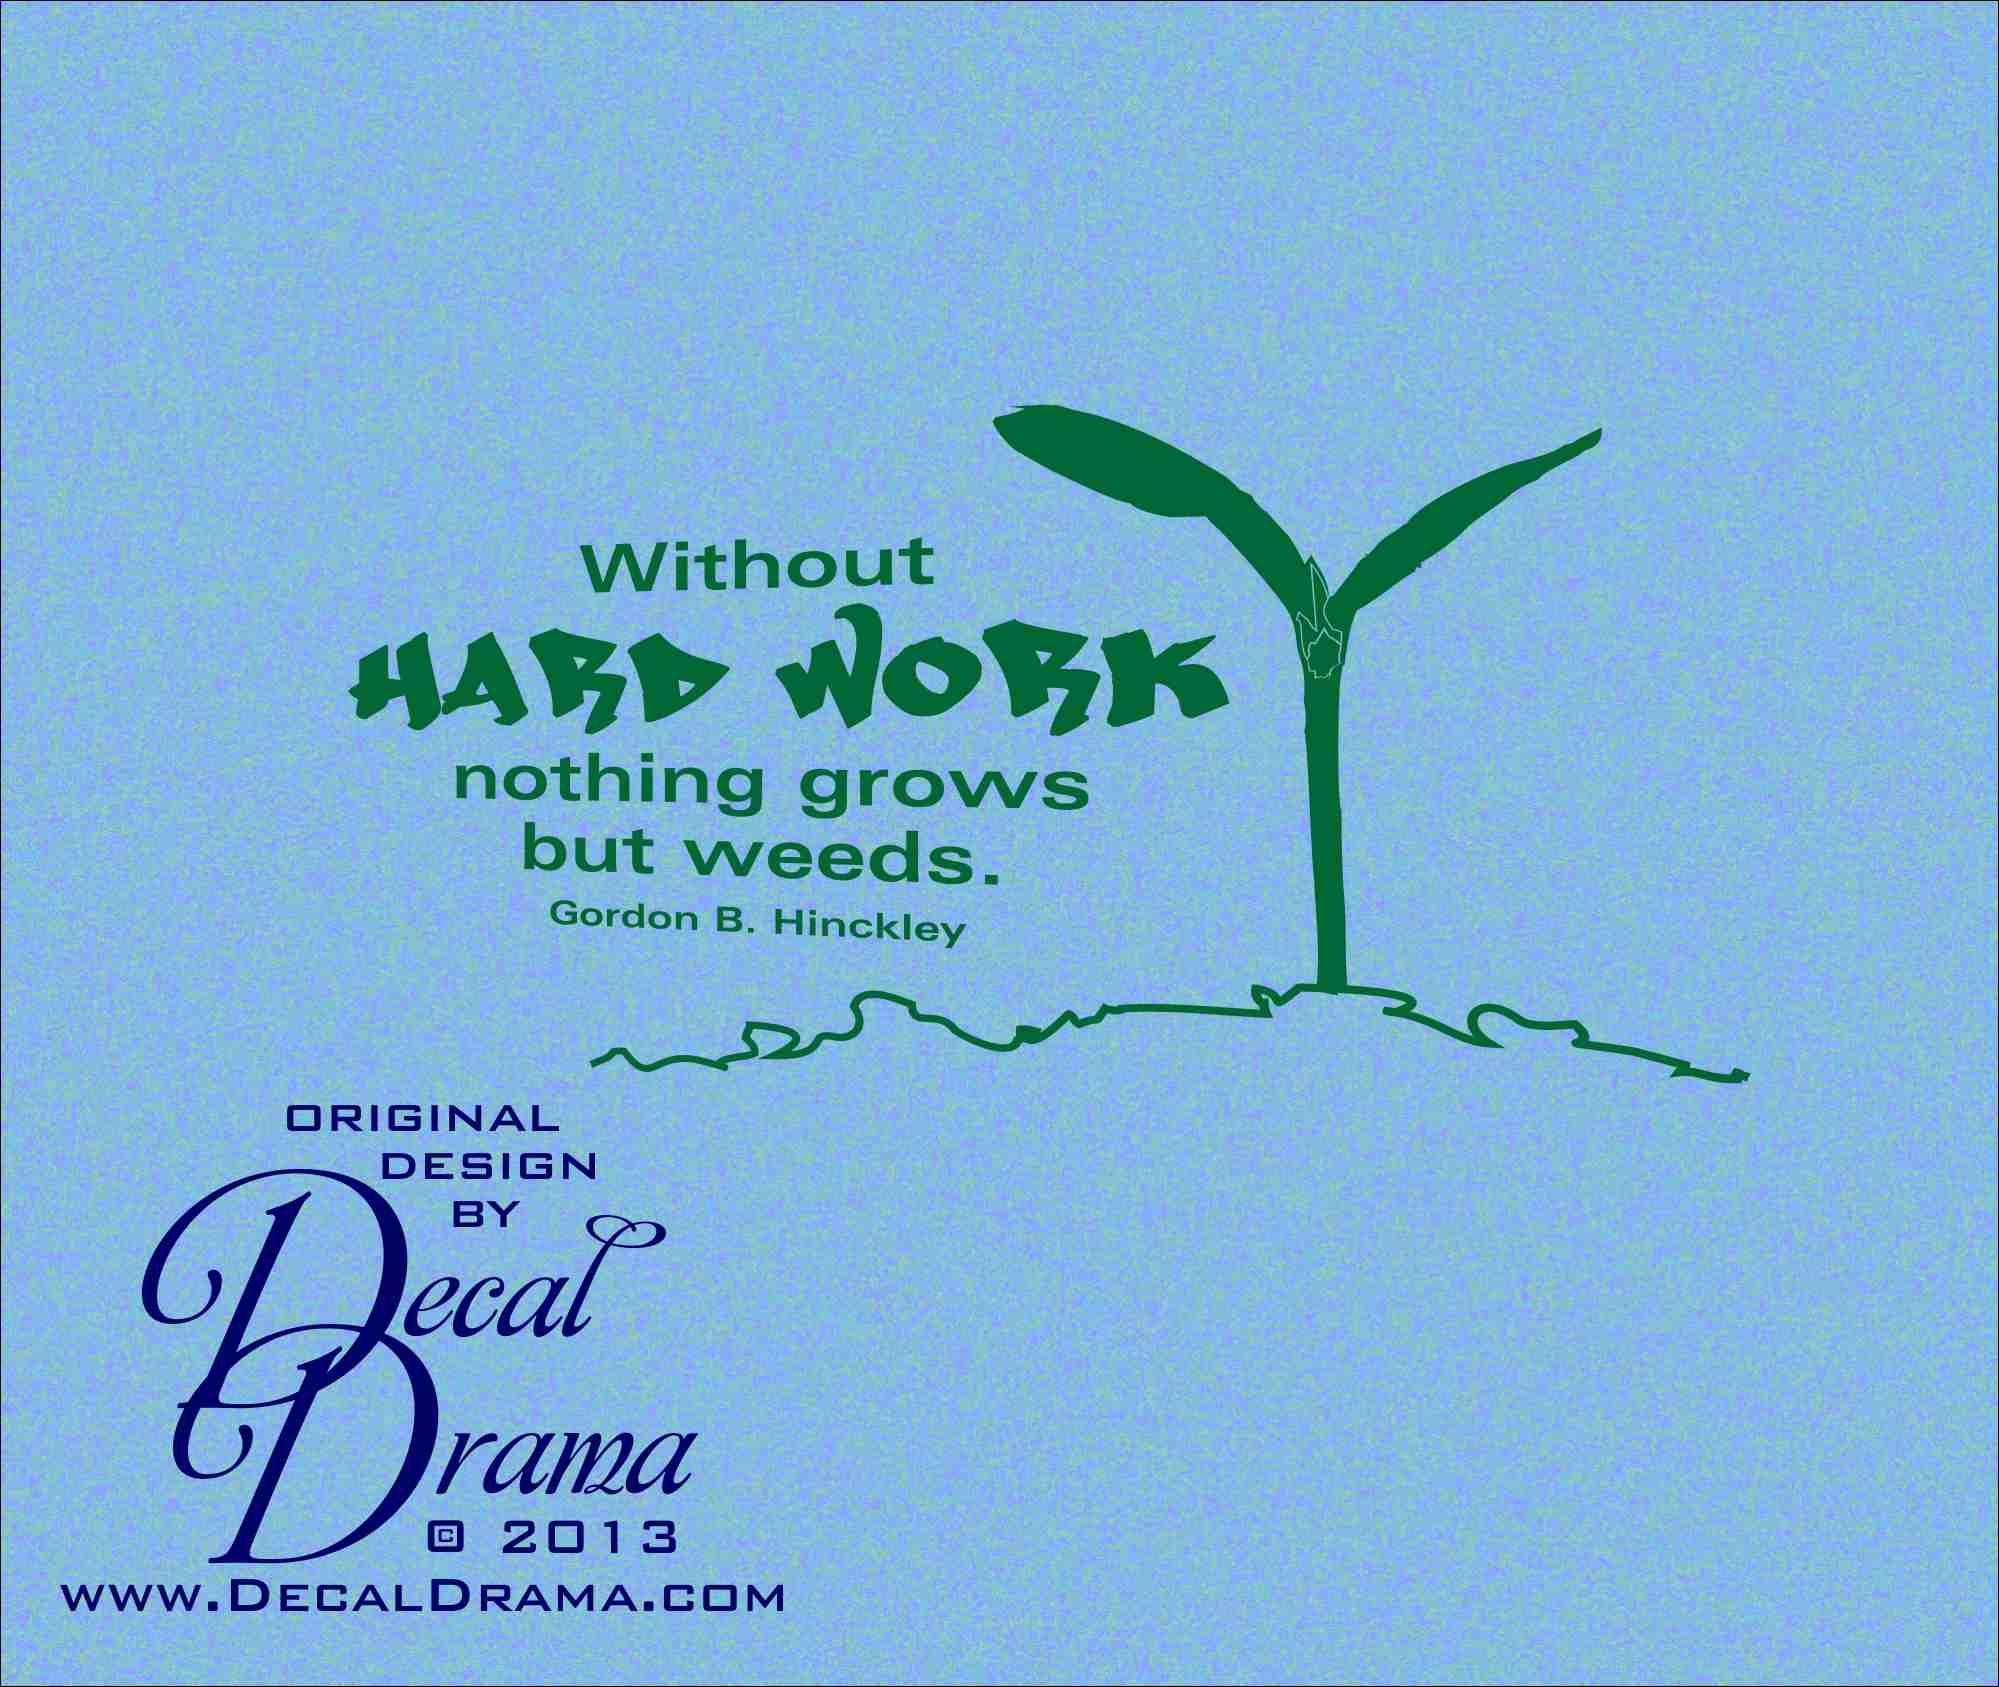 Gordon B Hinckley Quotes Decal Drama · Without Hard Work Nothing Grows But Weeds Gordon B